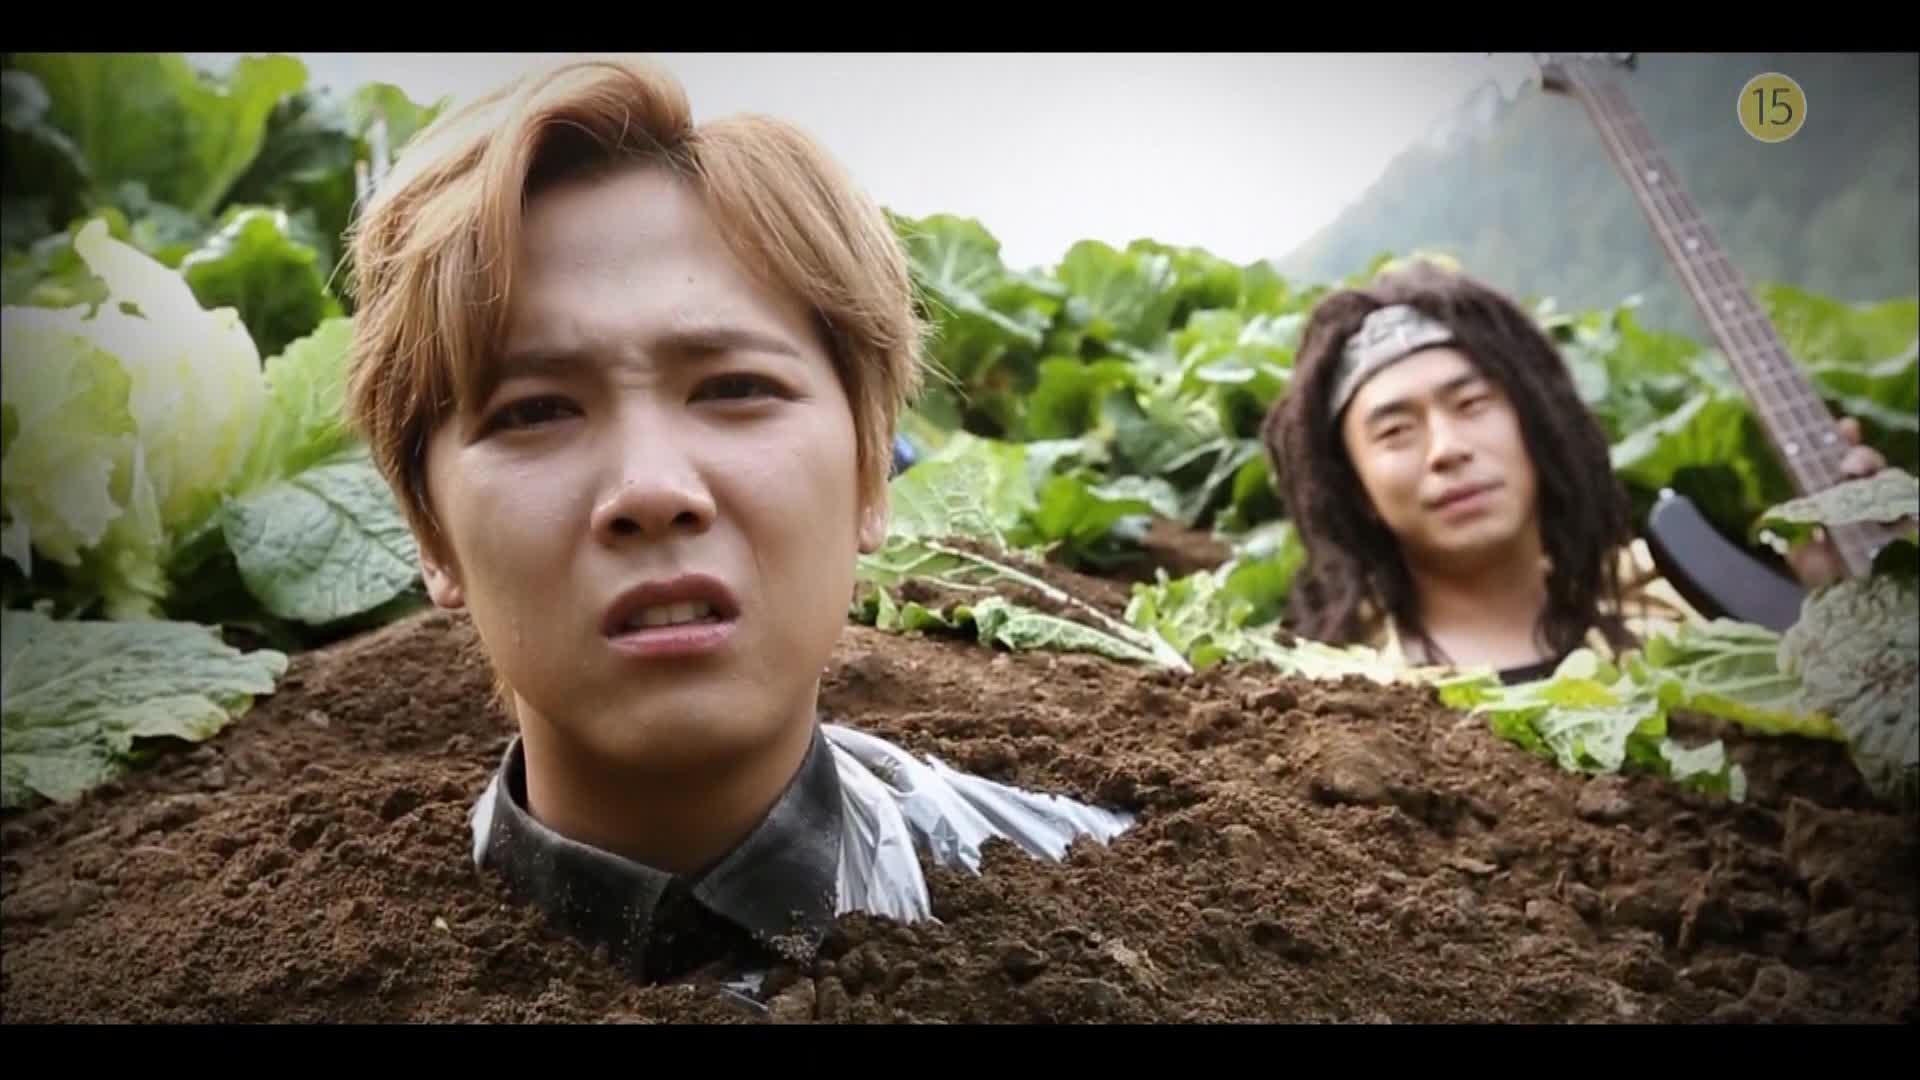 Trailer 3: Modern Farmer